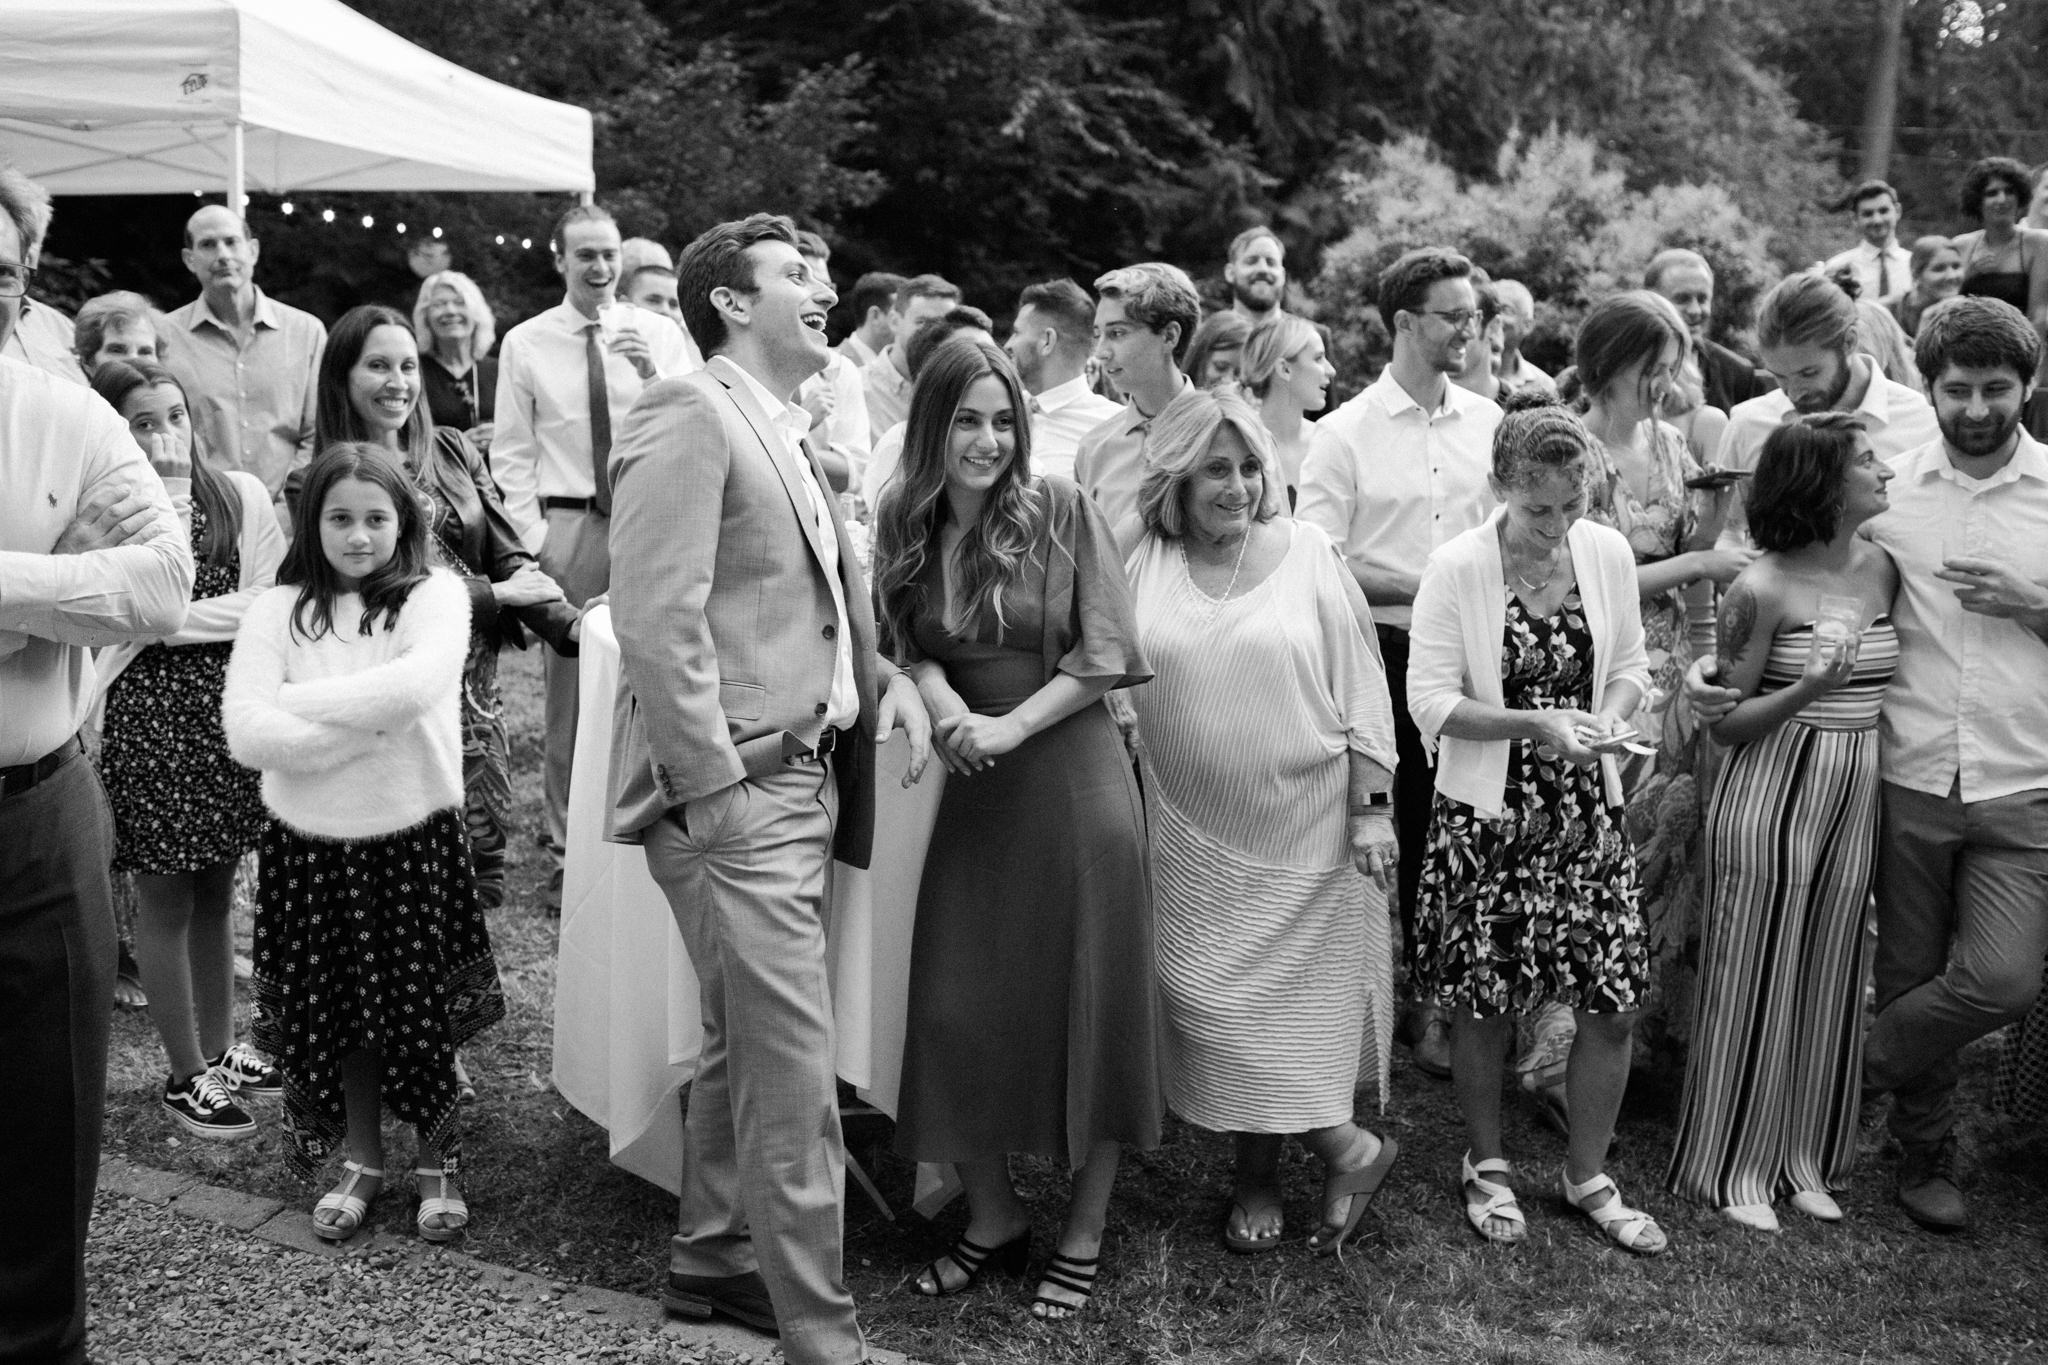 Backyard-Bainbridge-Island-Wedding-Alycia-Lovell-Photography-205.JPG